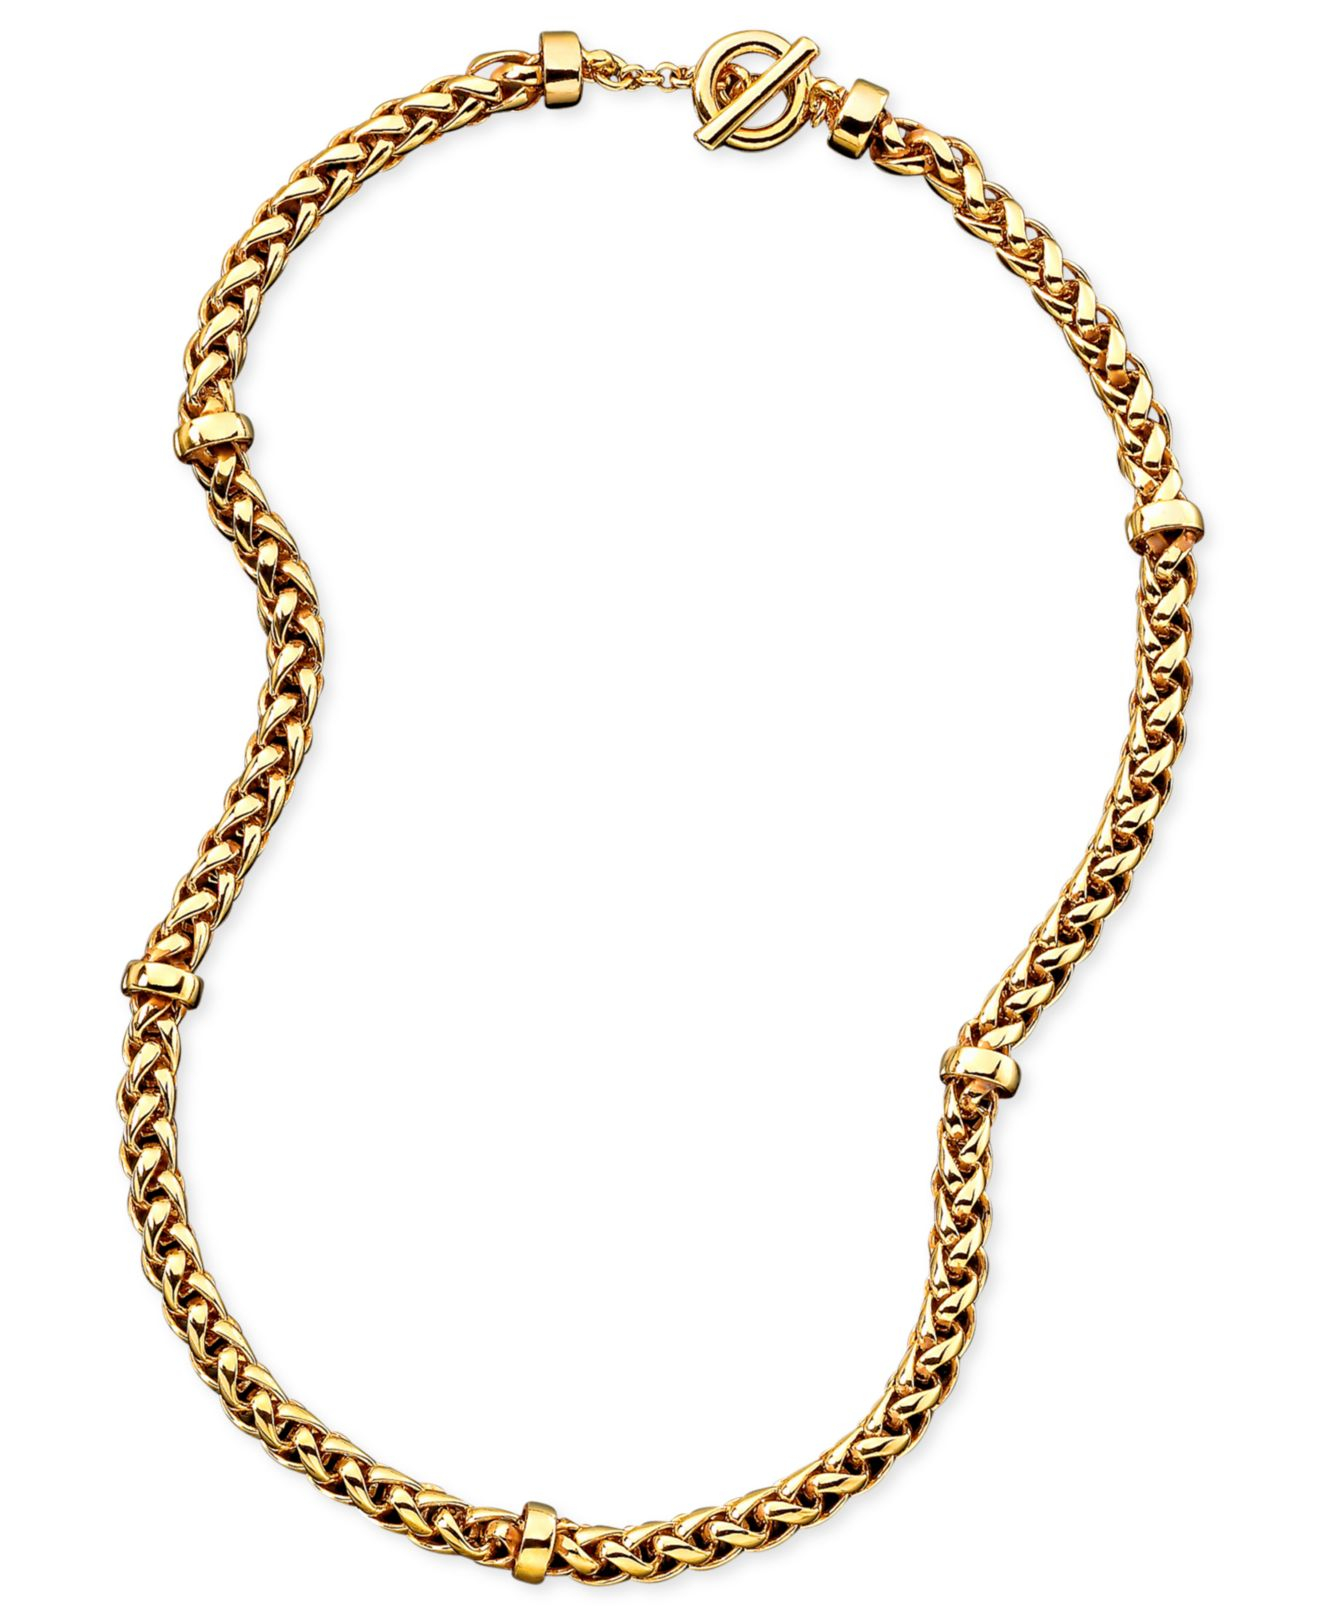 Ralph Lauren Lauren By Braided Chain Necklace 18quot In Gold